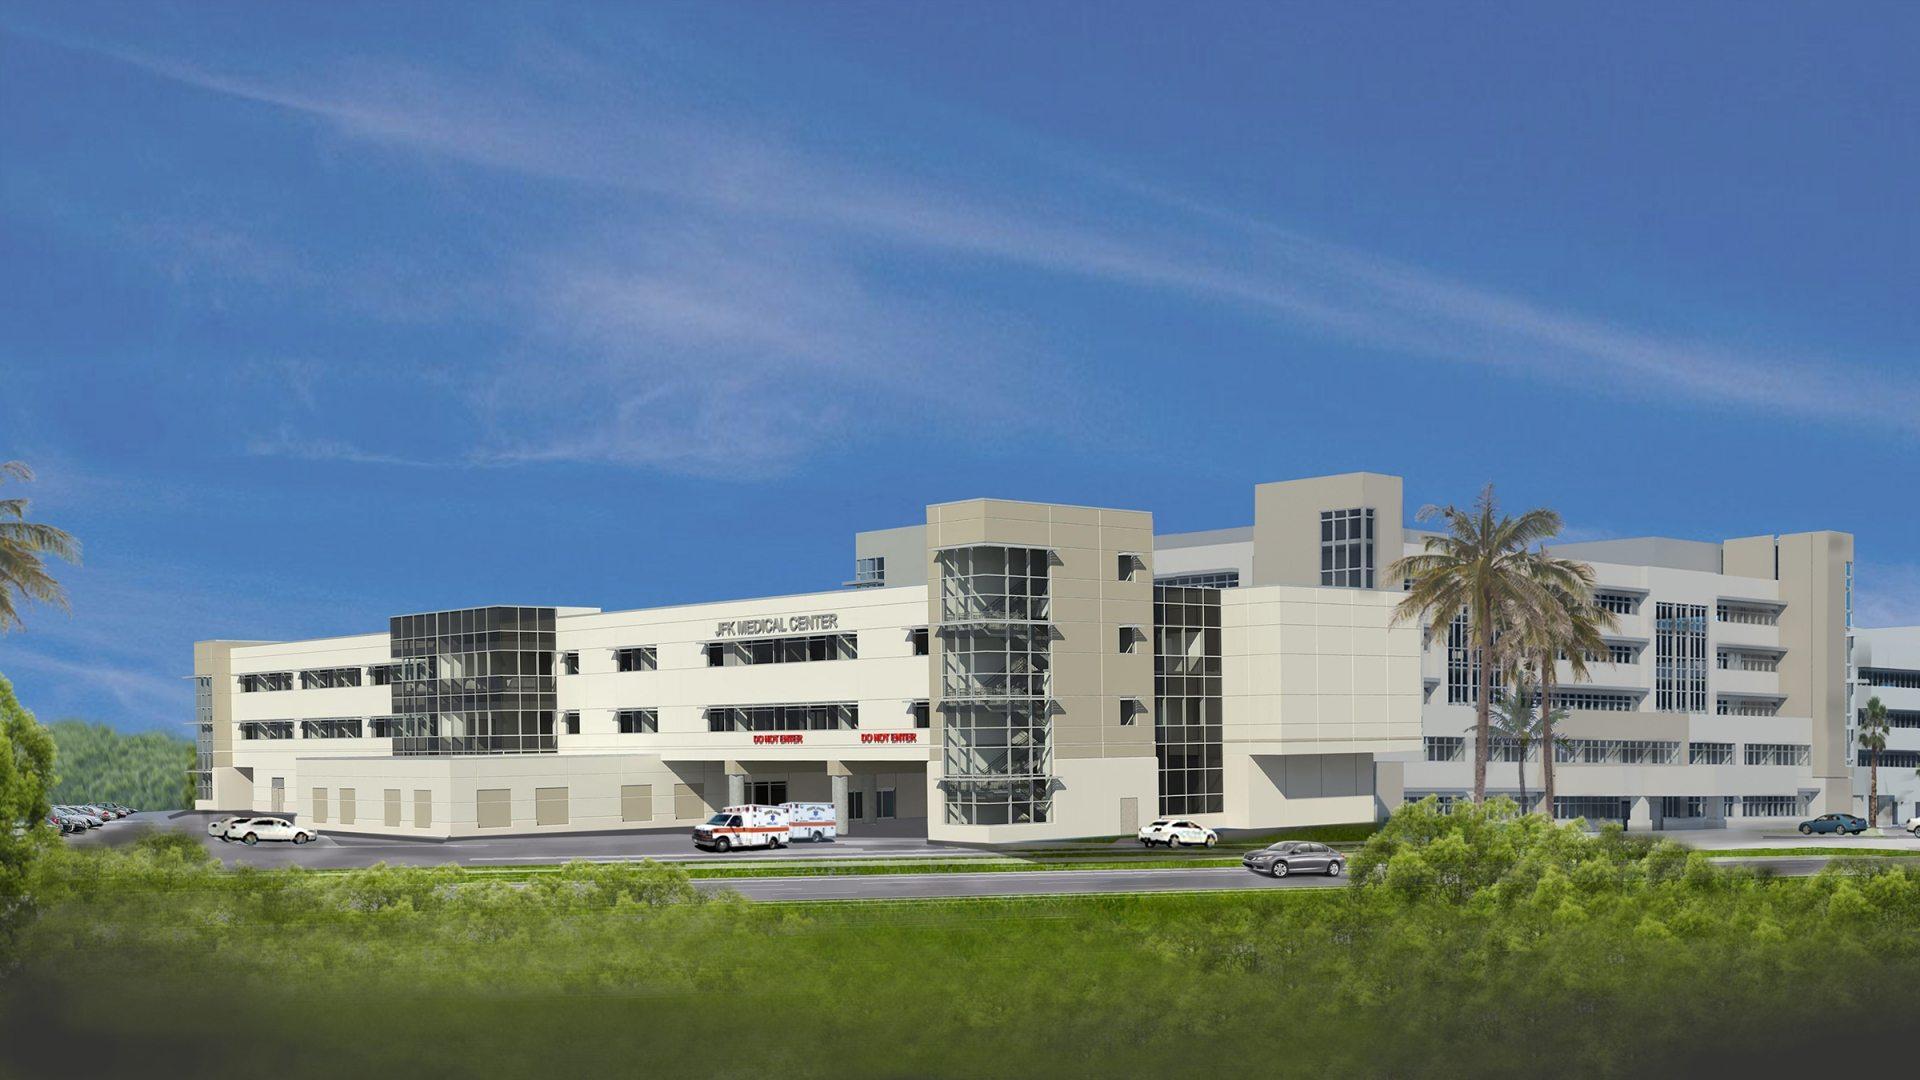 Jfk medical center tmpartners pllc for Urgent care palm beach gardens